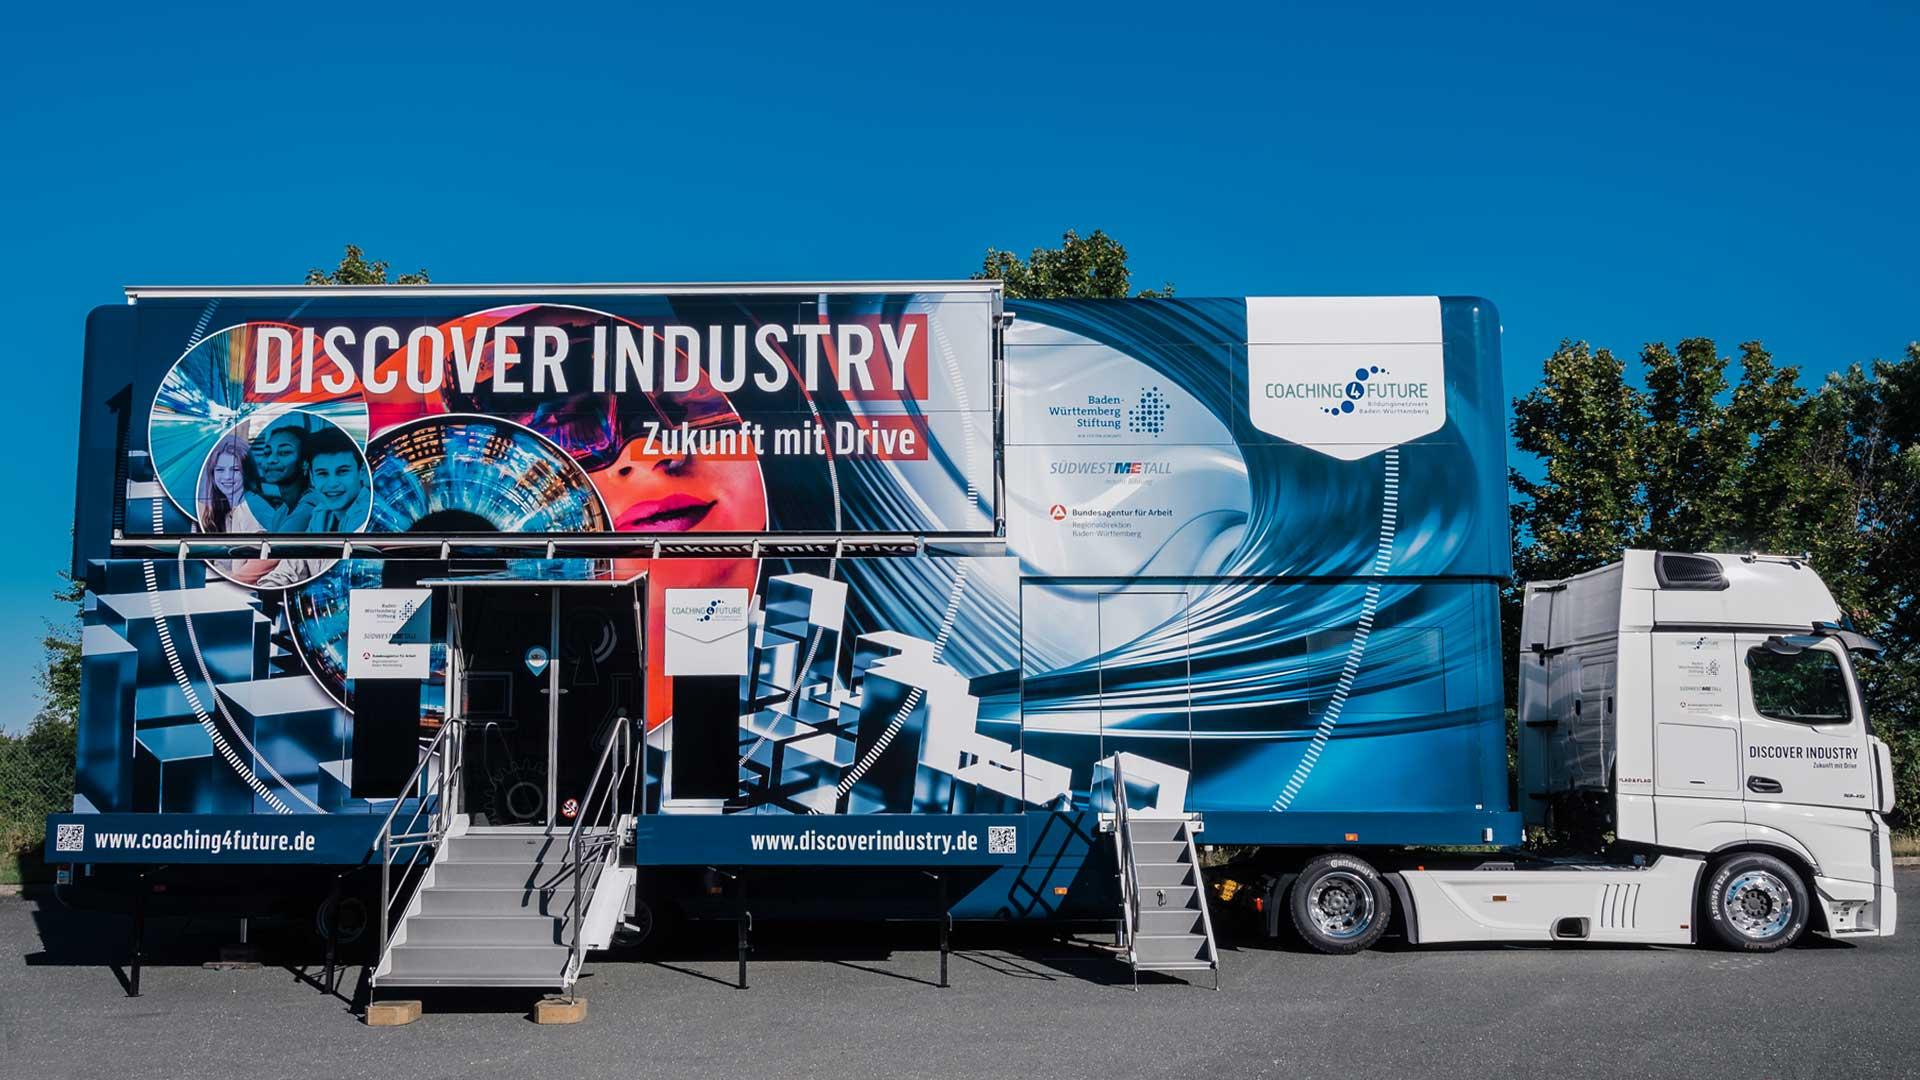 Discover Industry – Roadshow zum Thema Industry 4.0